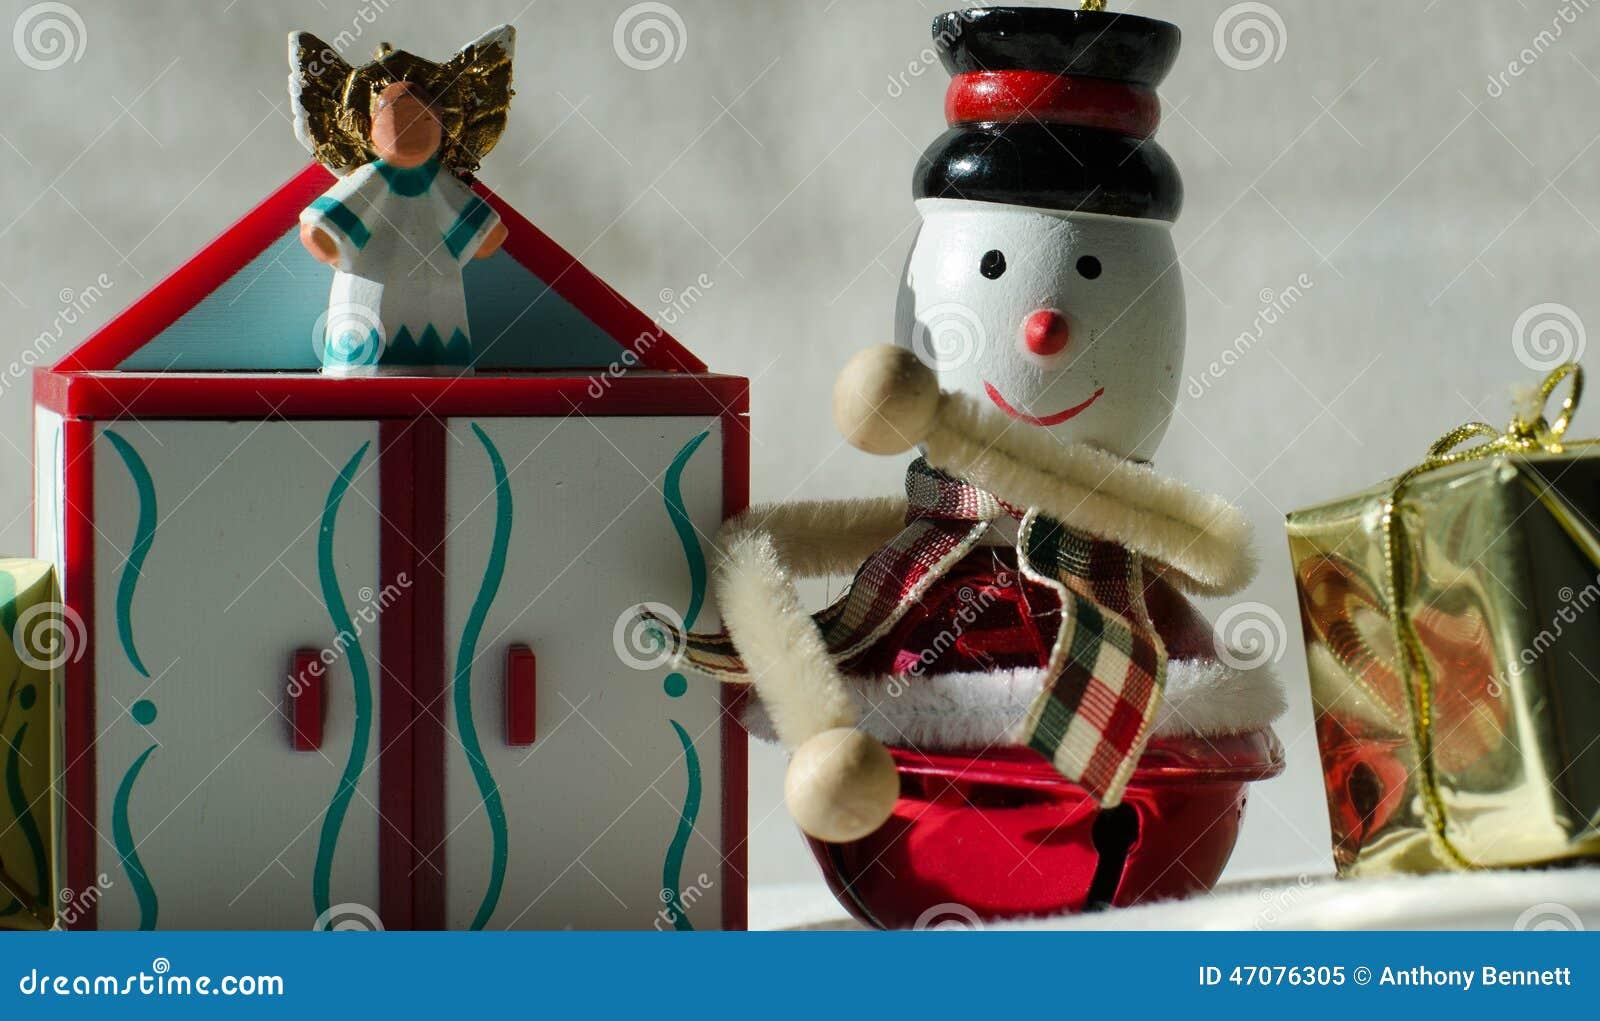 Little Angel Toys : Christmas decorations stock photo image